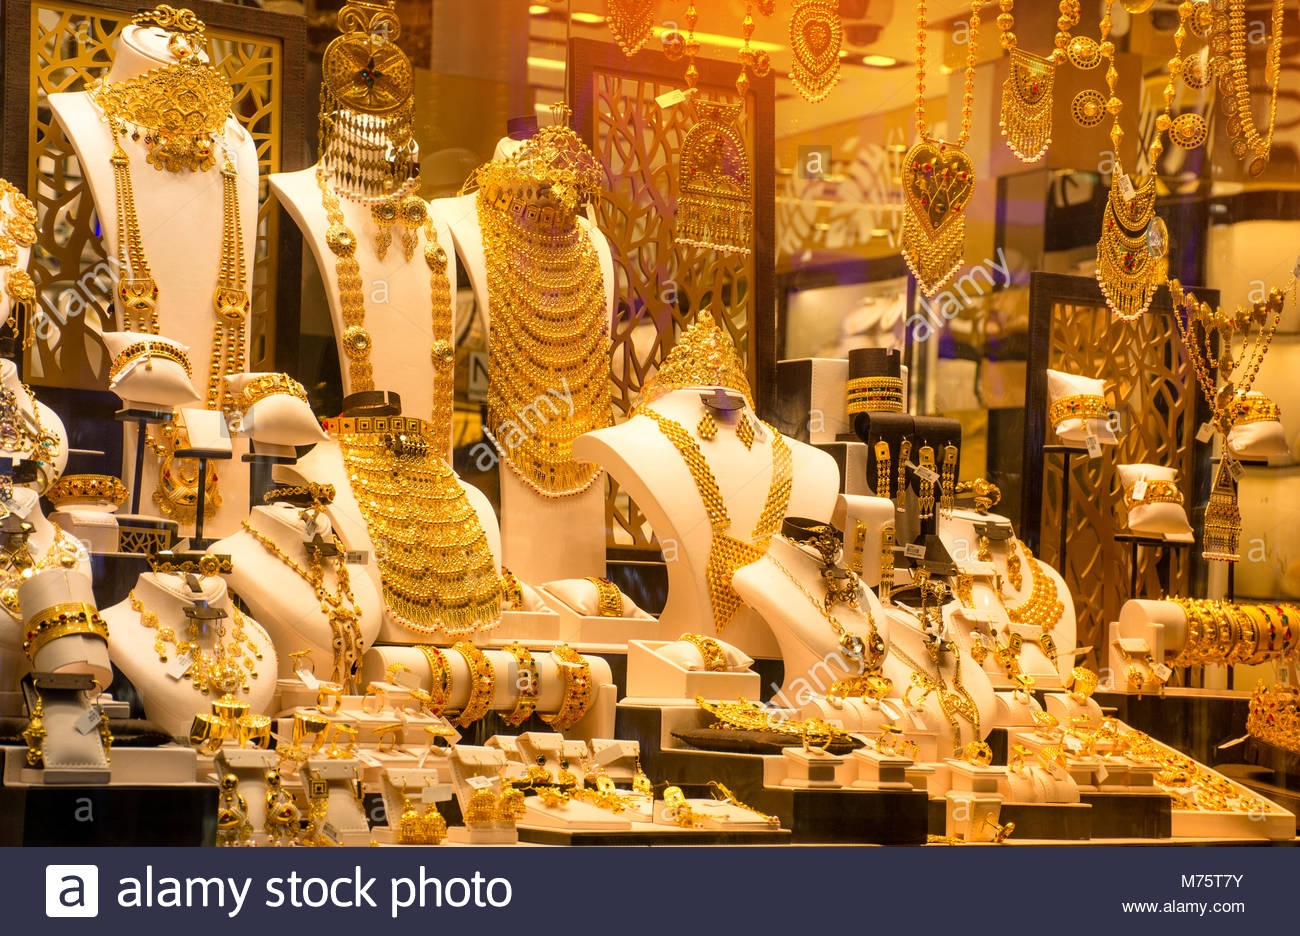 A Shot From gold Souk Dubai , Famous Gold Market - Stock Image